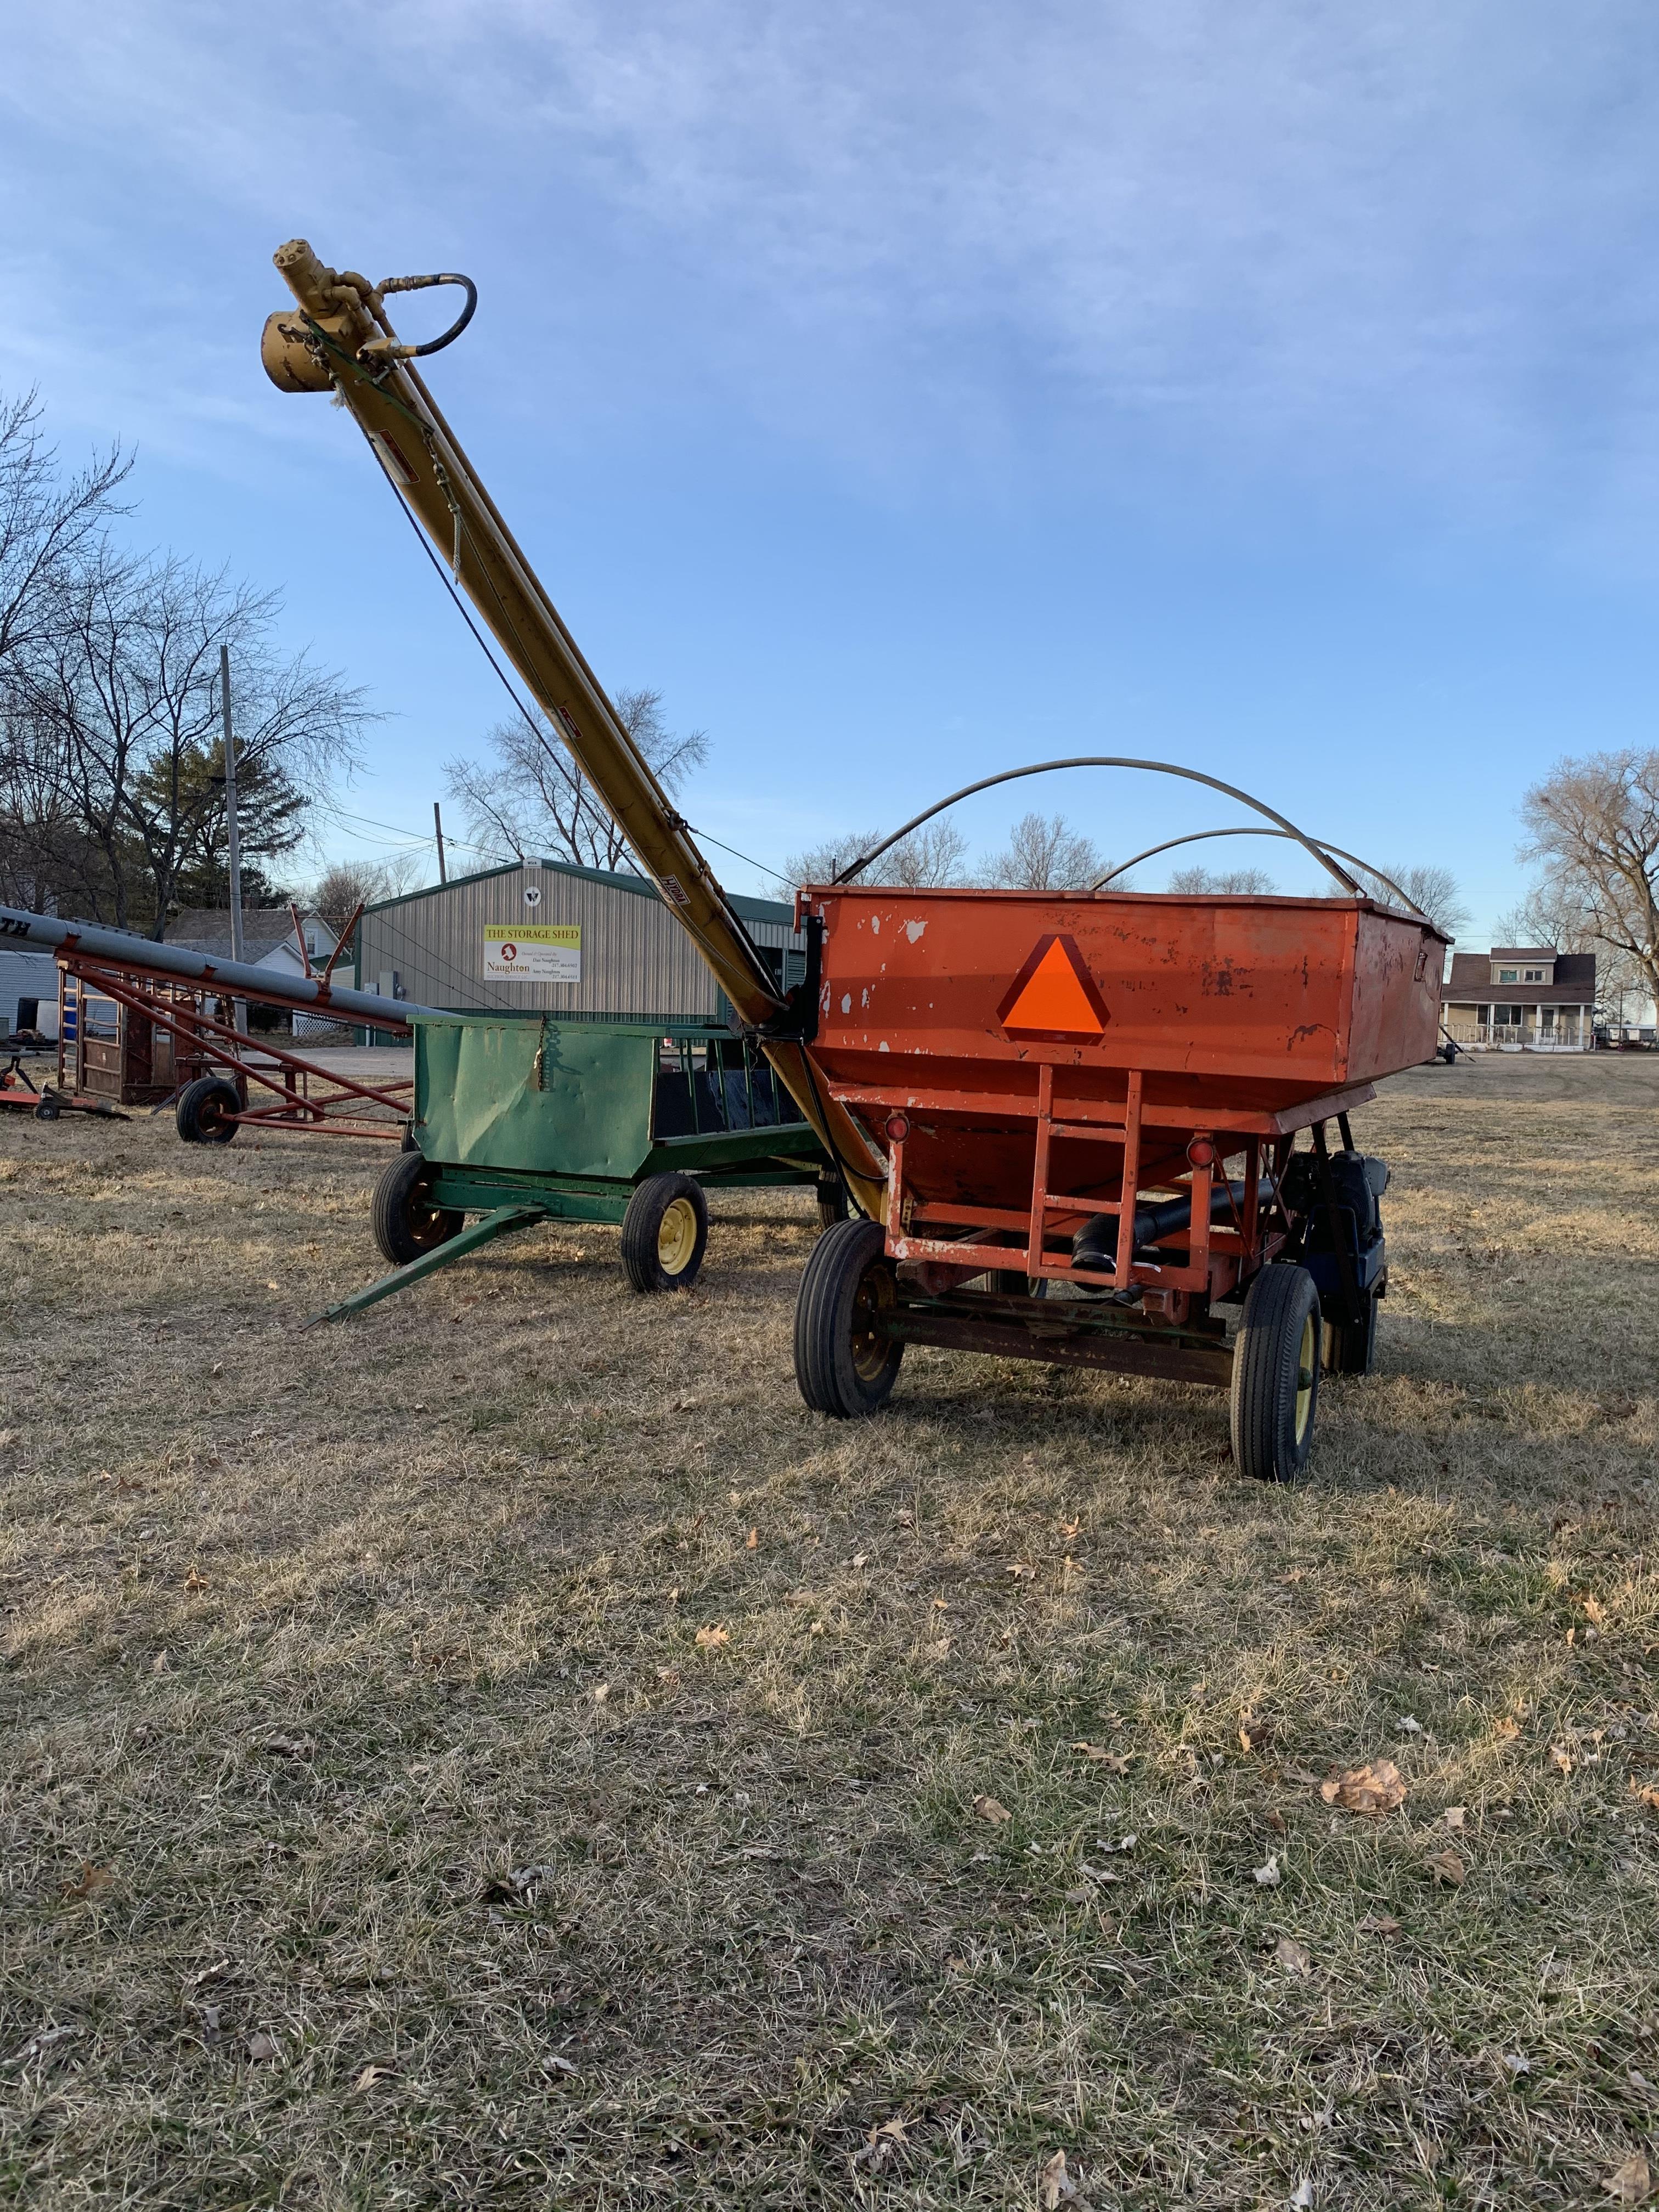 Killbros 250 Side Dump Wagon W/JD 1065 Gear, Hydraulic Drive Seed Auger - Image 2 of 4